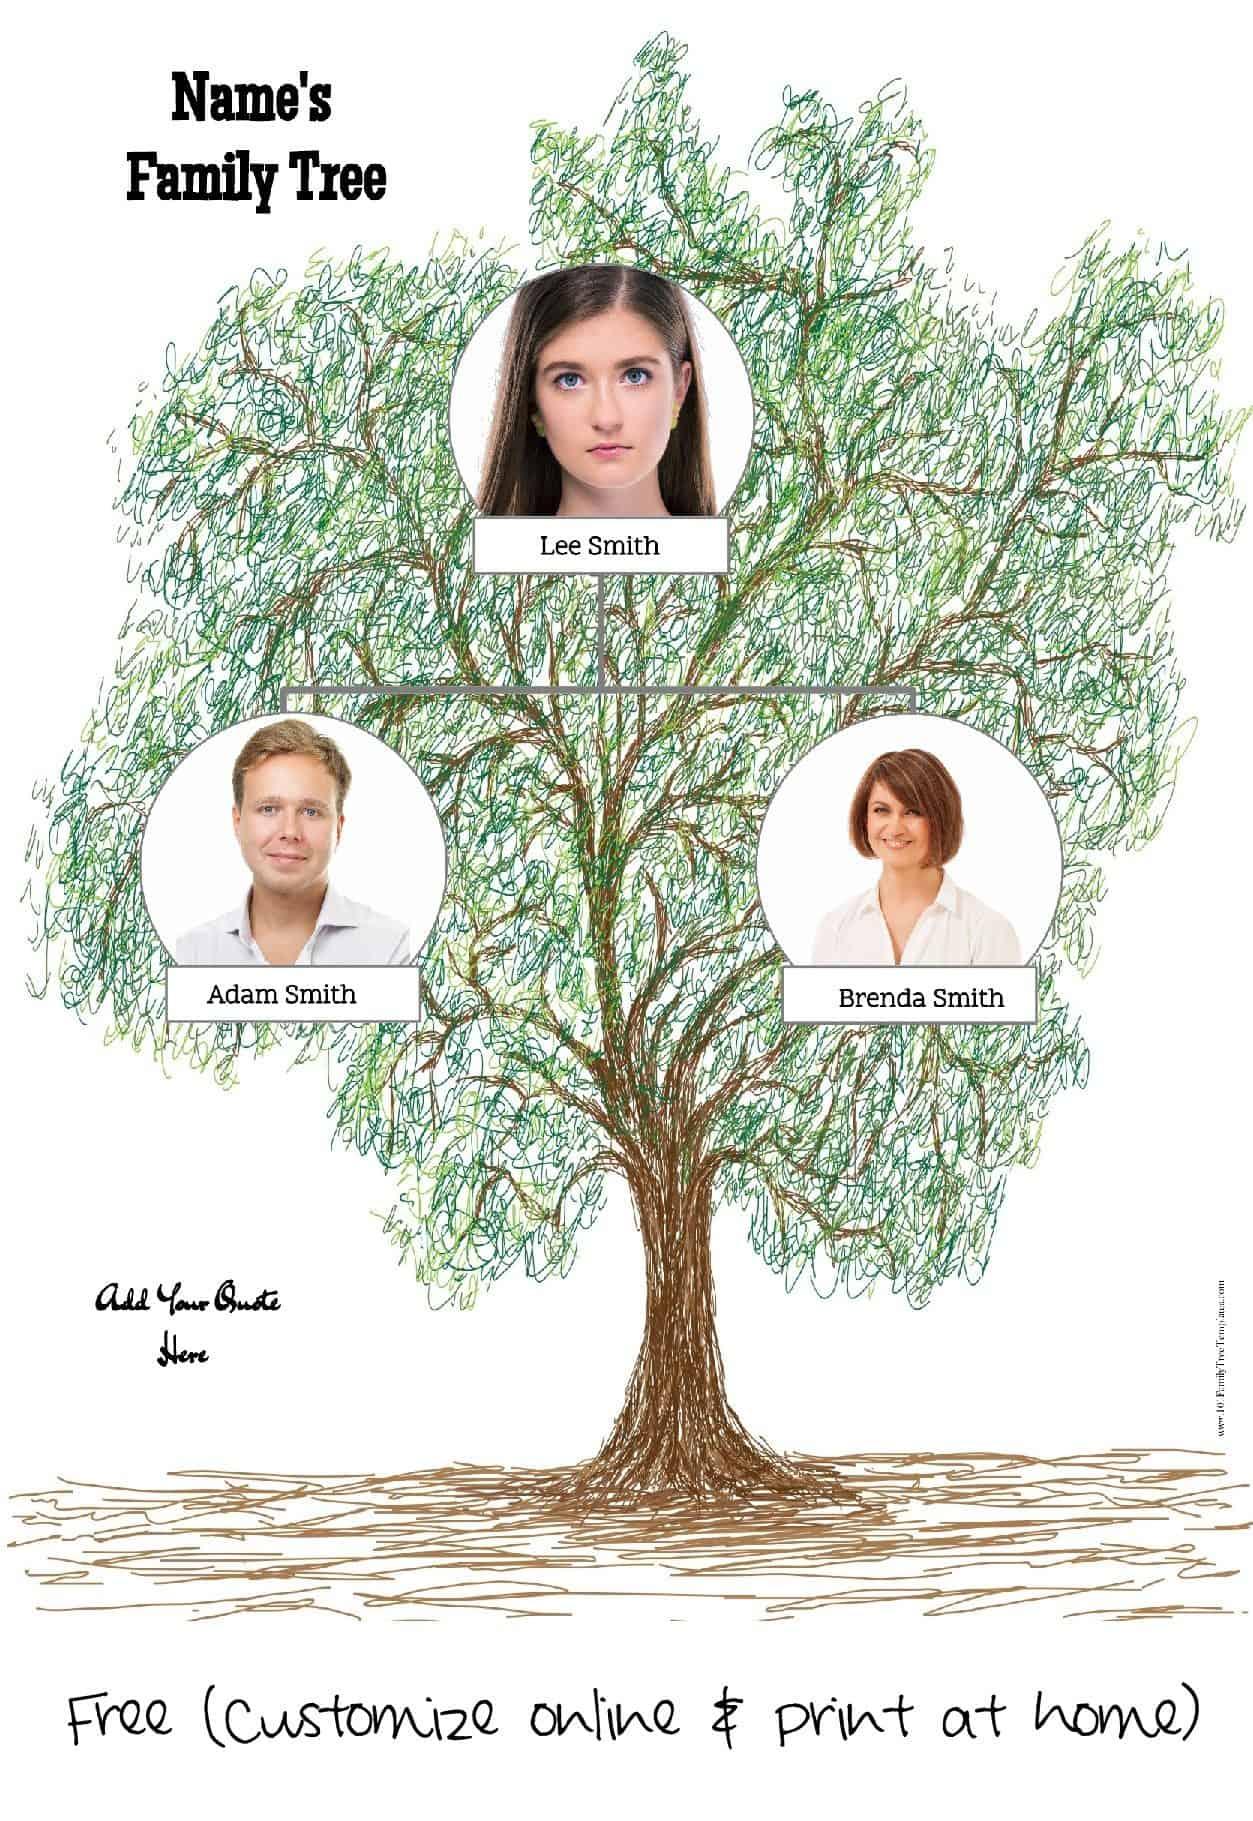 free editable family tree maker templates